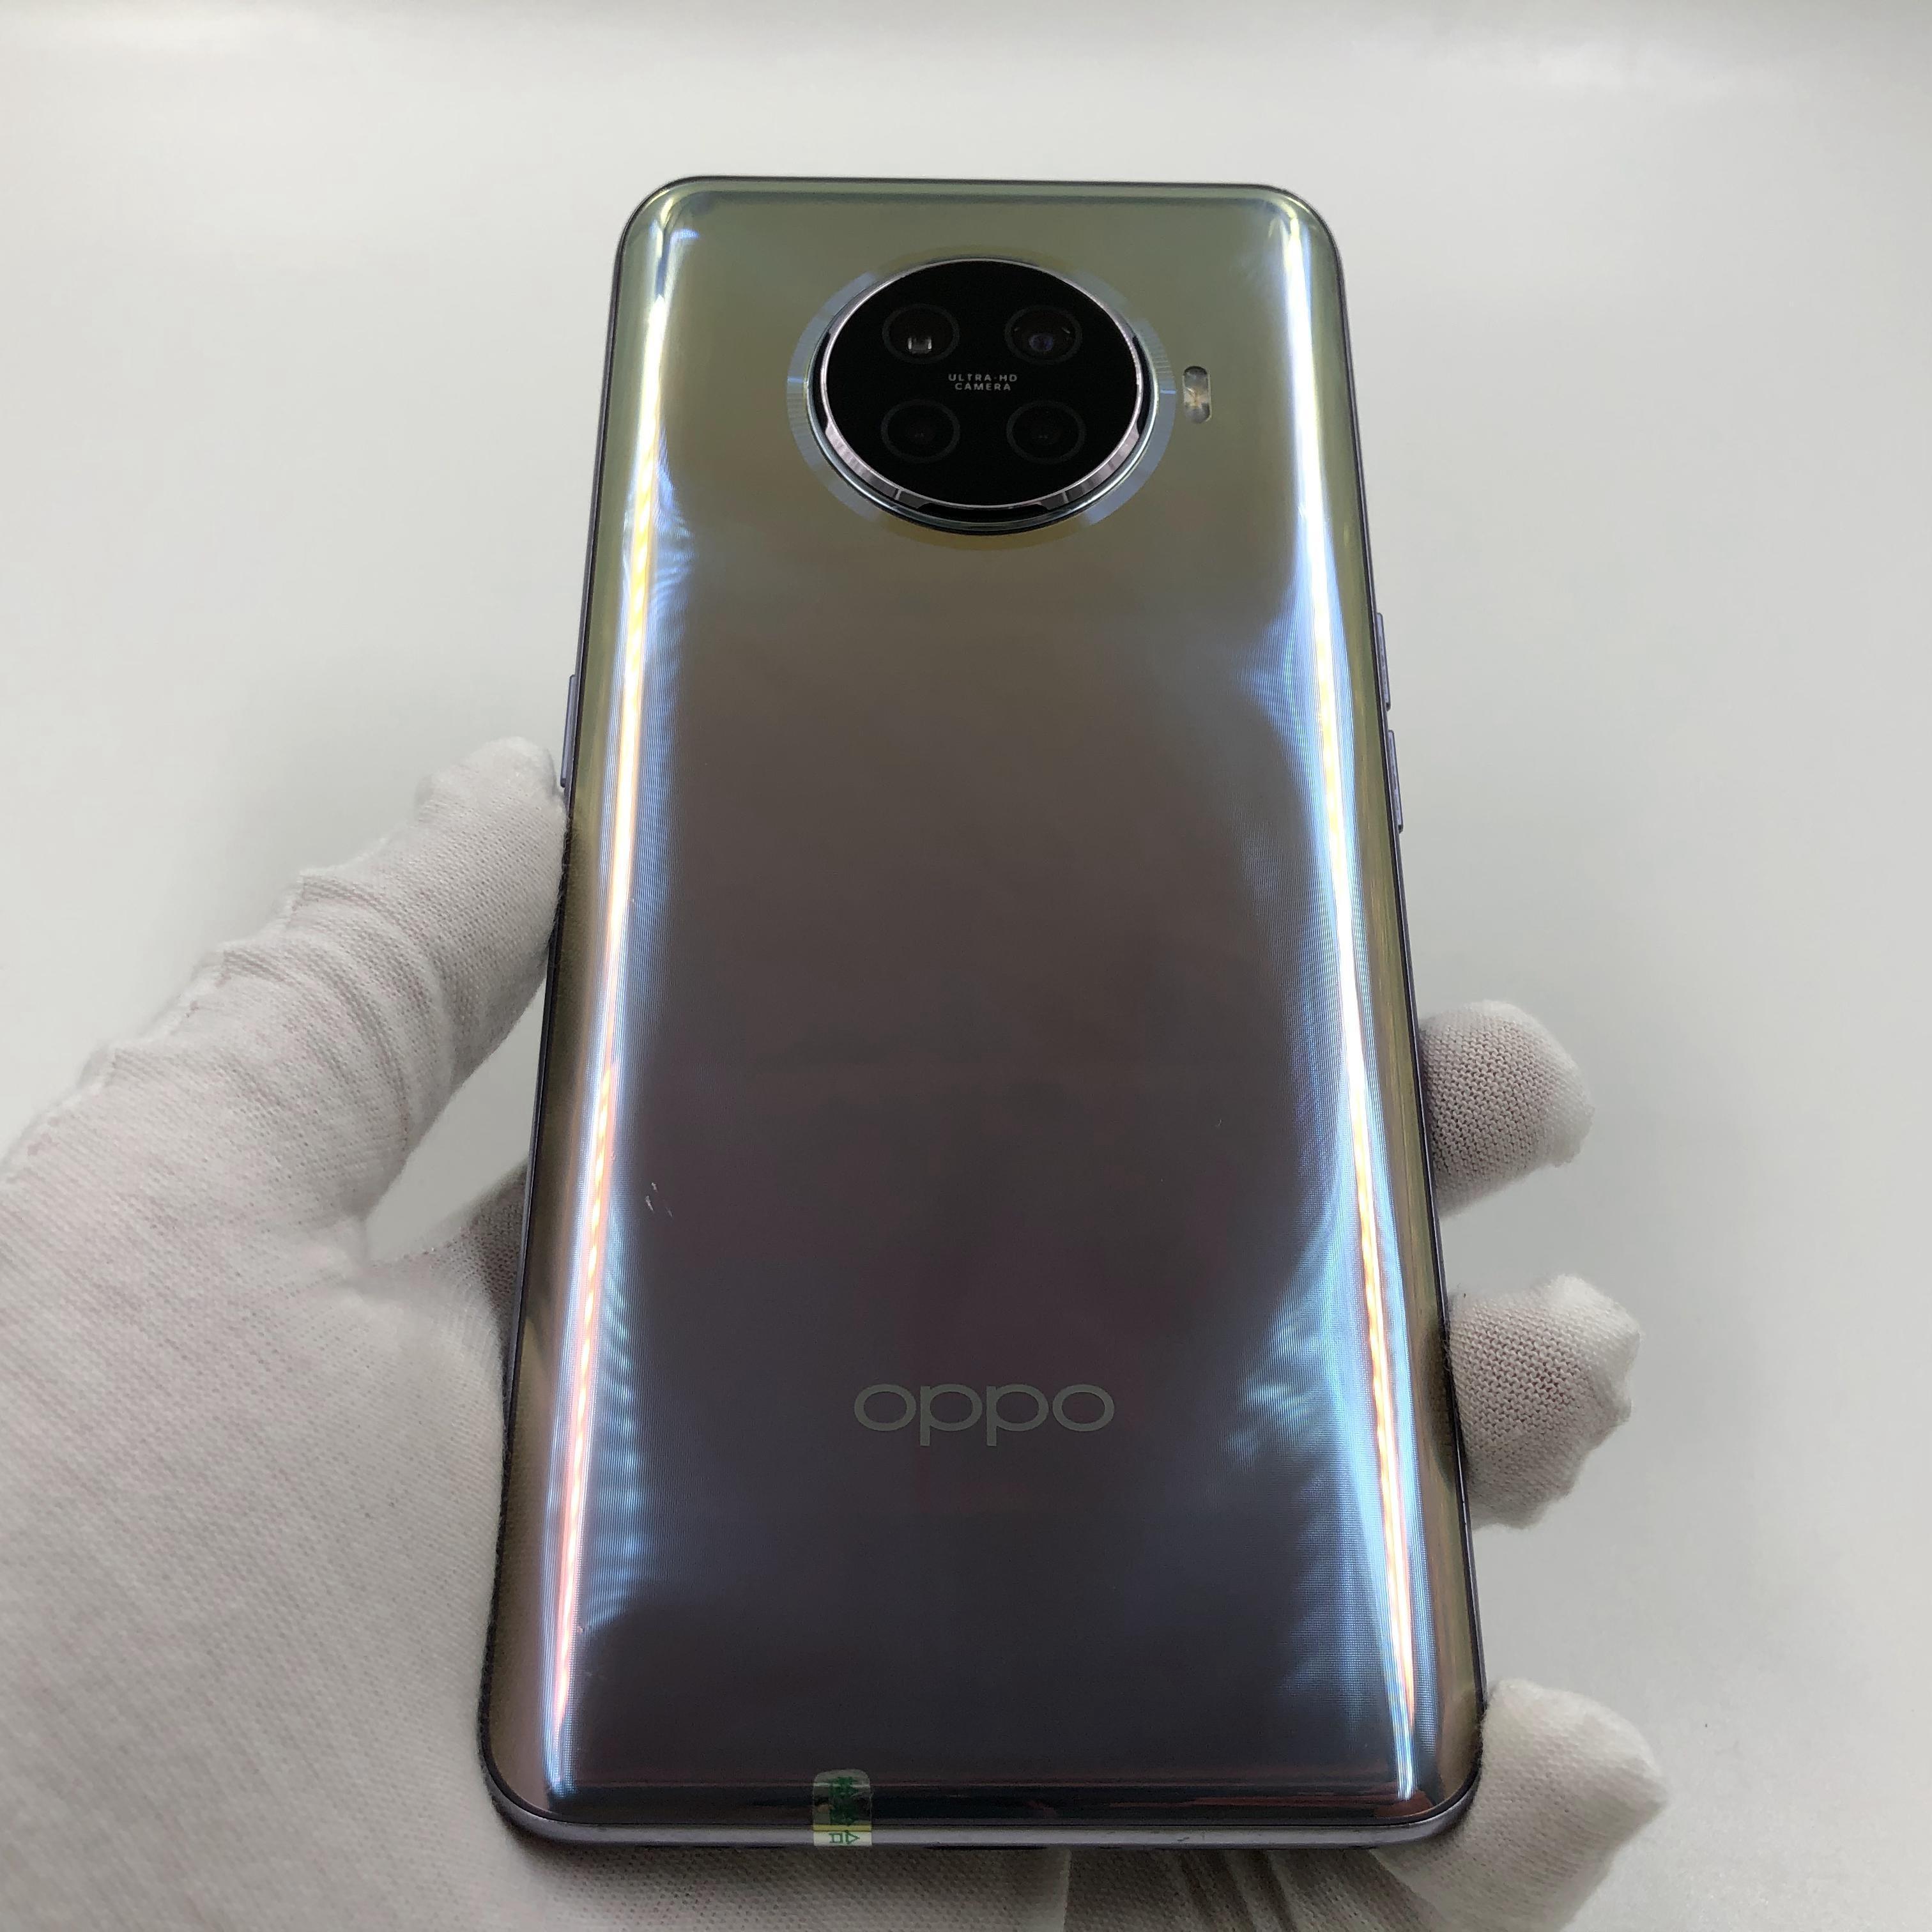 oppo【Ace2 5G】5G全网通 梦幻紫 8G/256G 国行 8成新 真机实拍